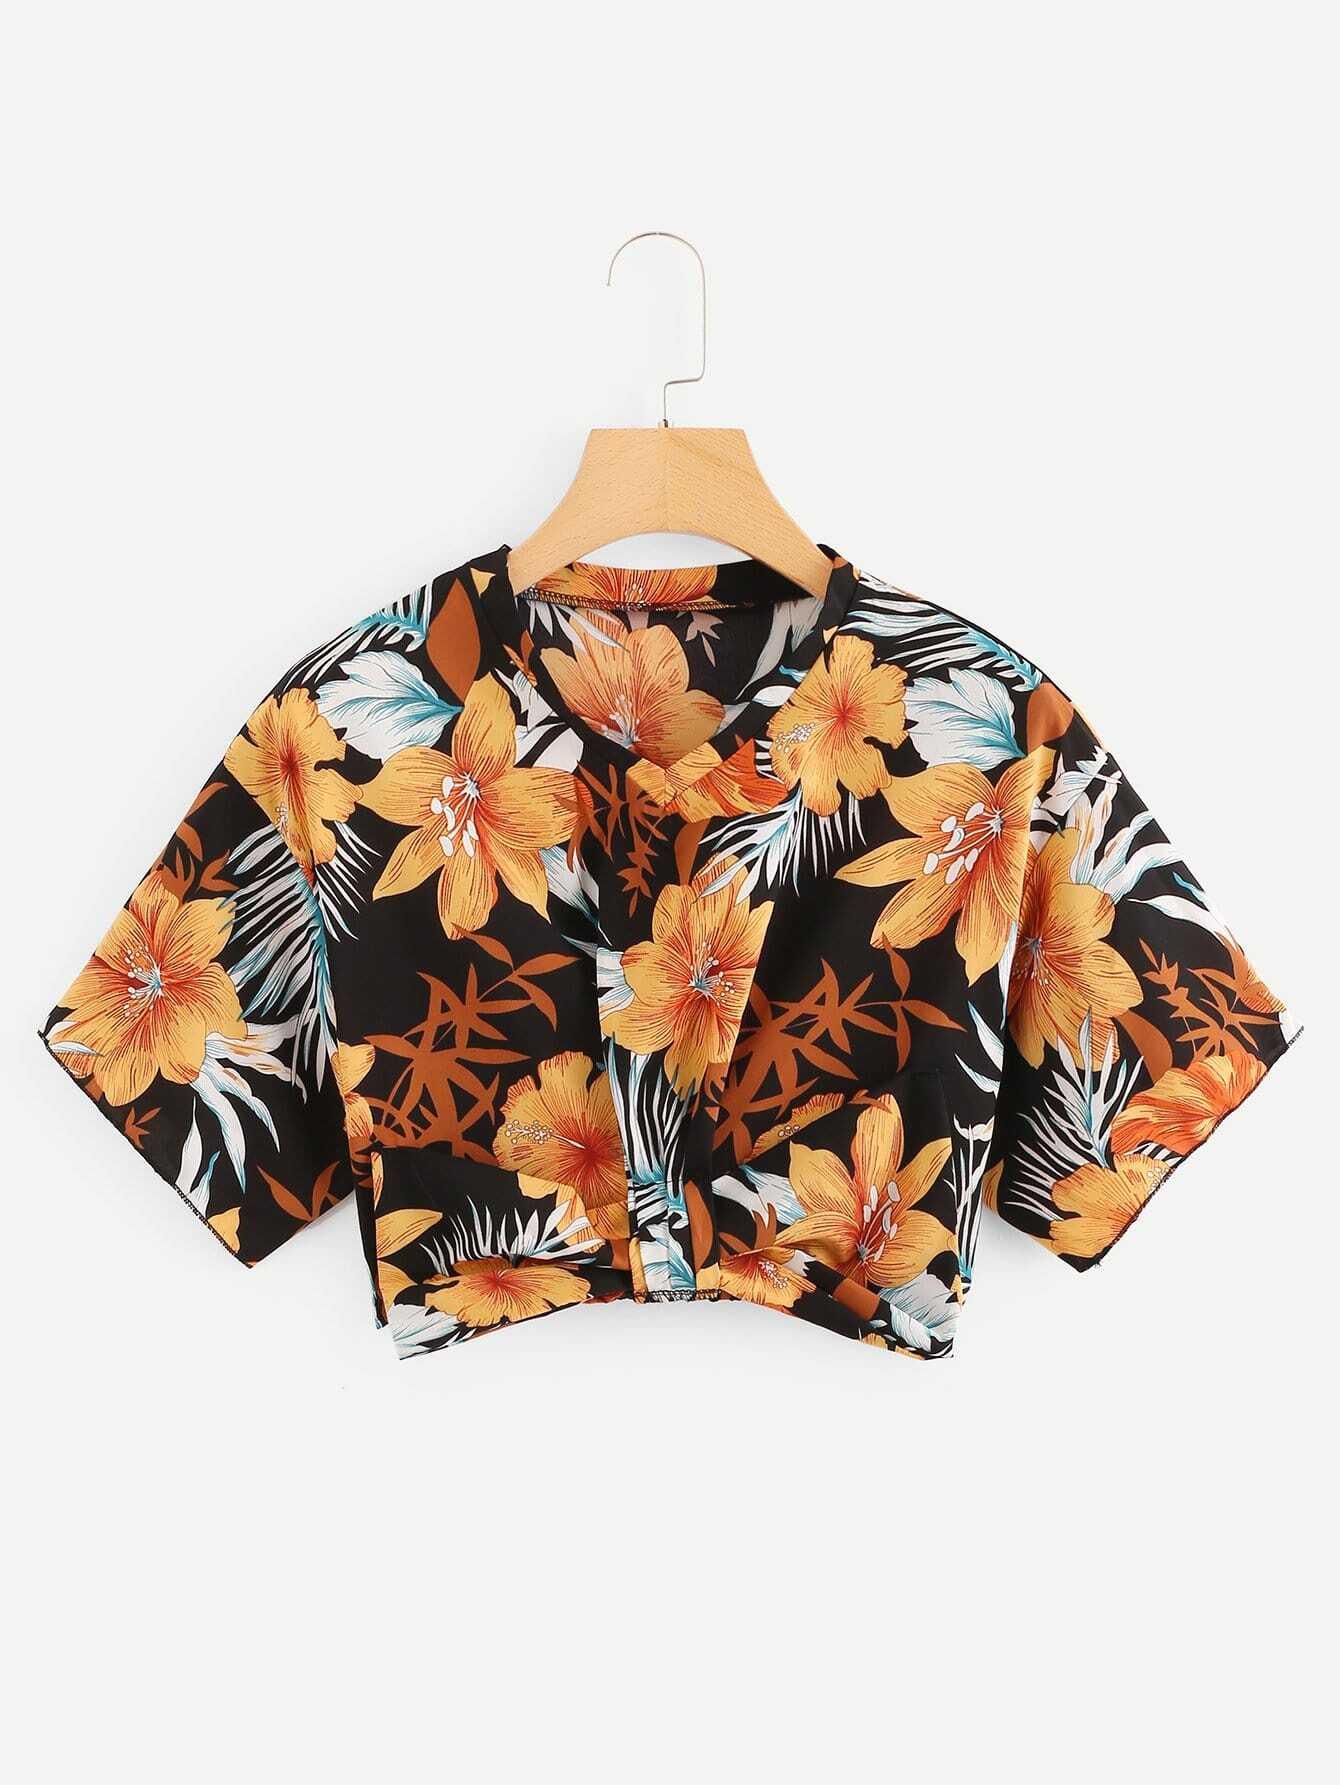 Tropical Print Bow Embellished Crop Top black choker sleeveless crop top